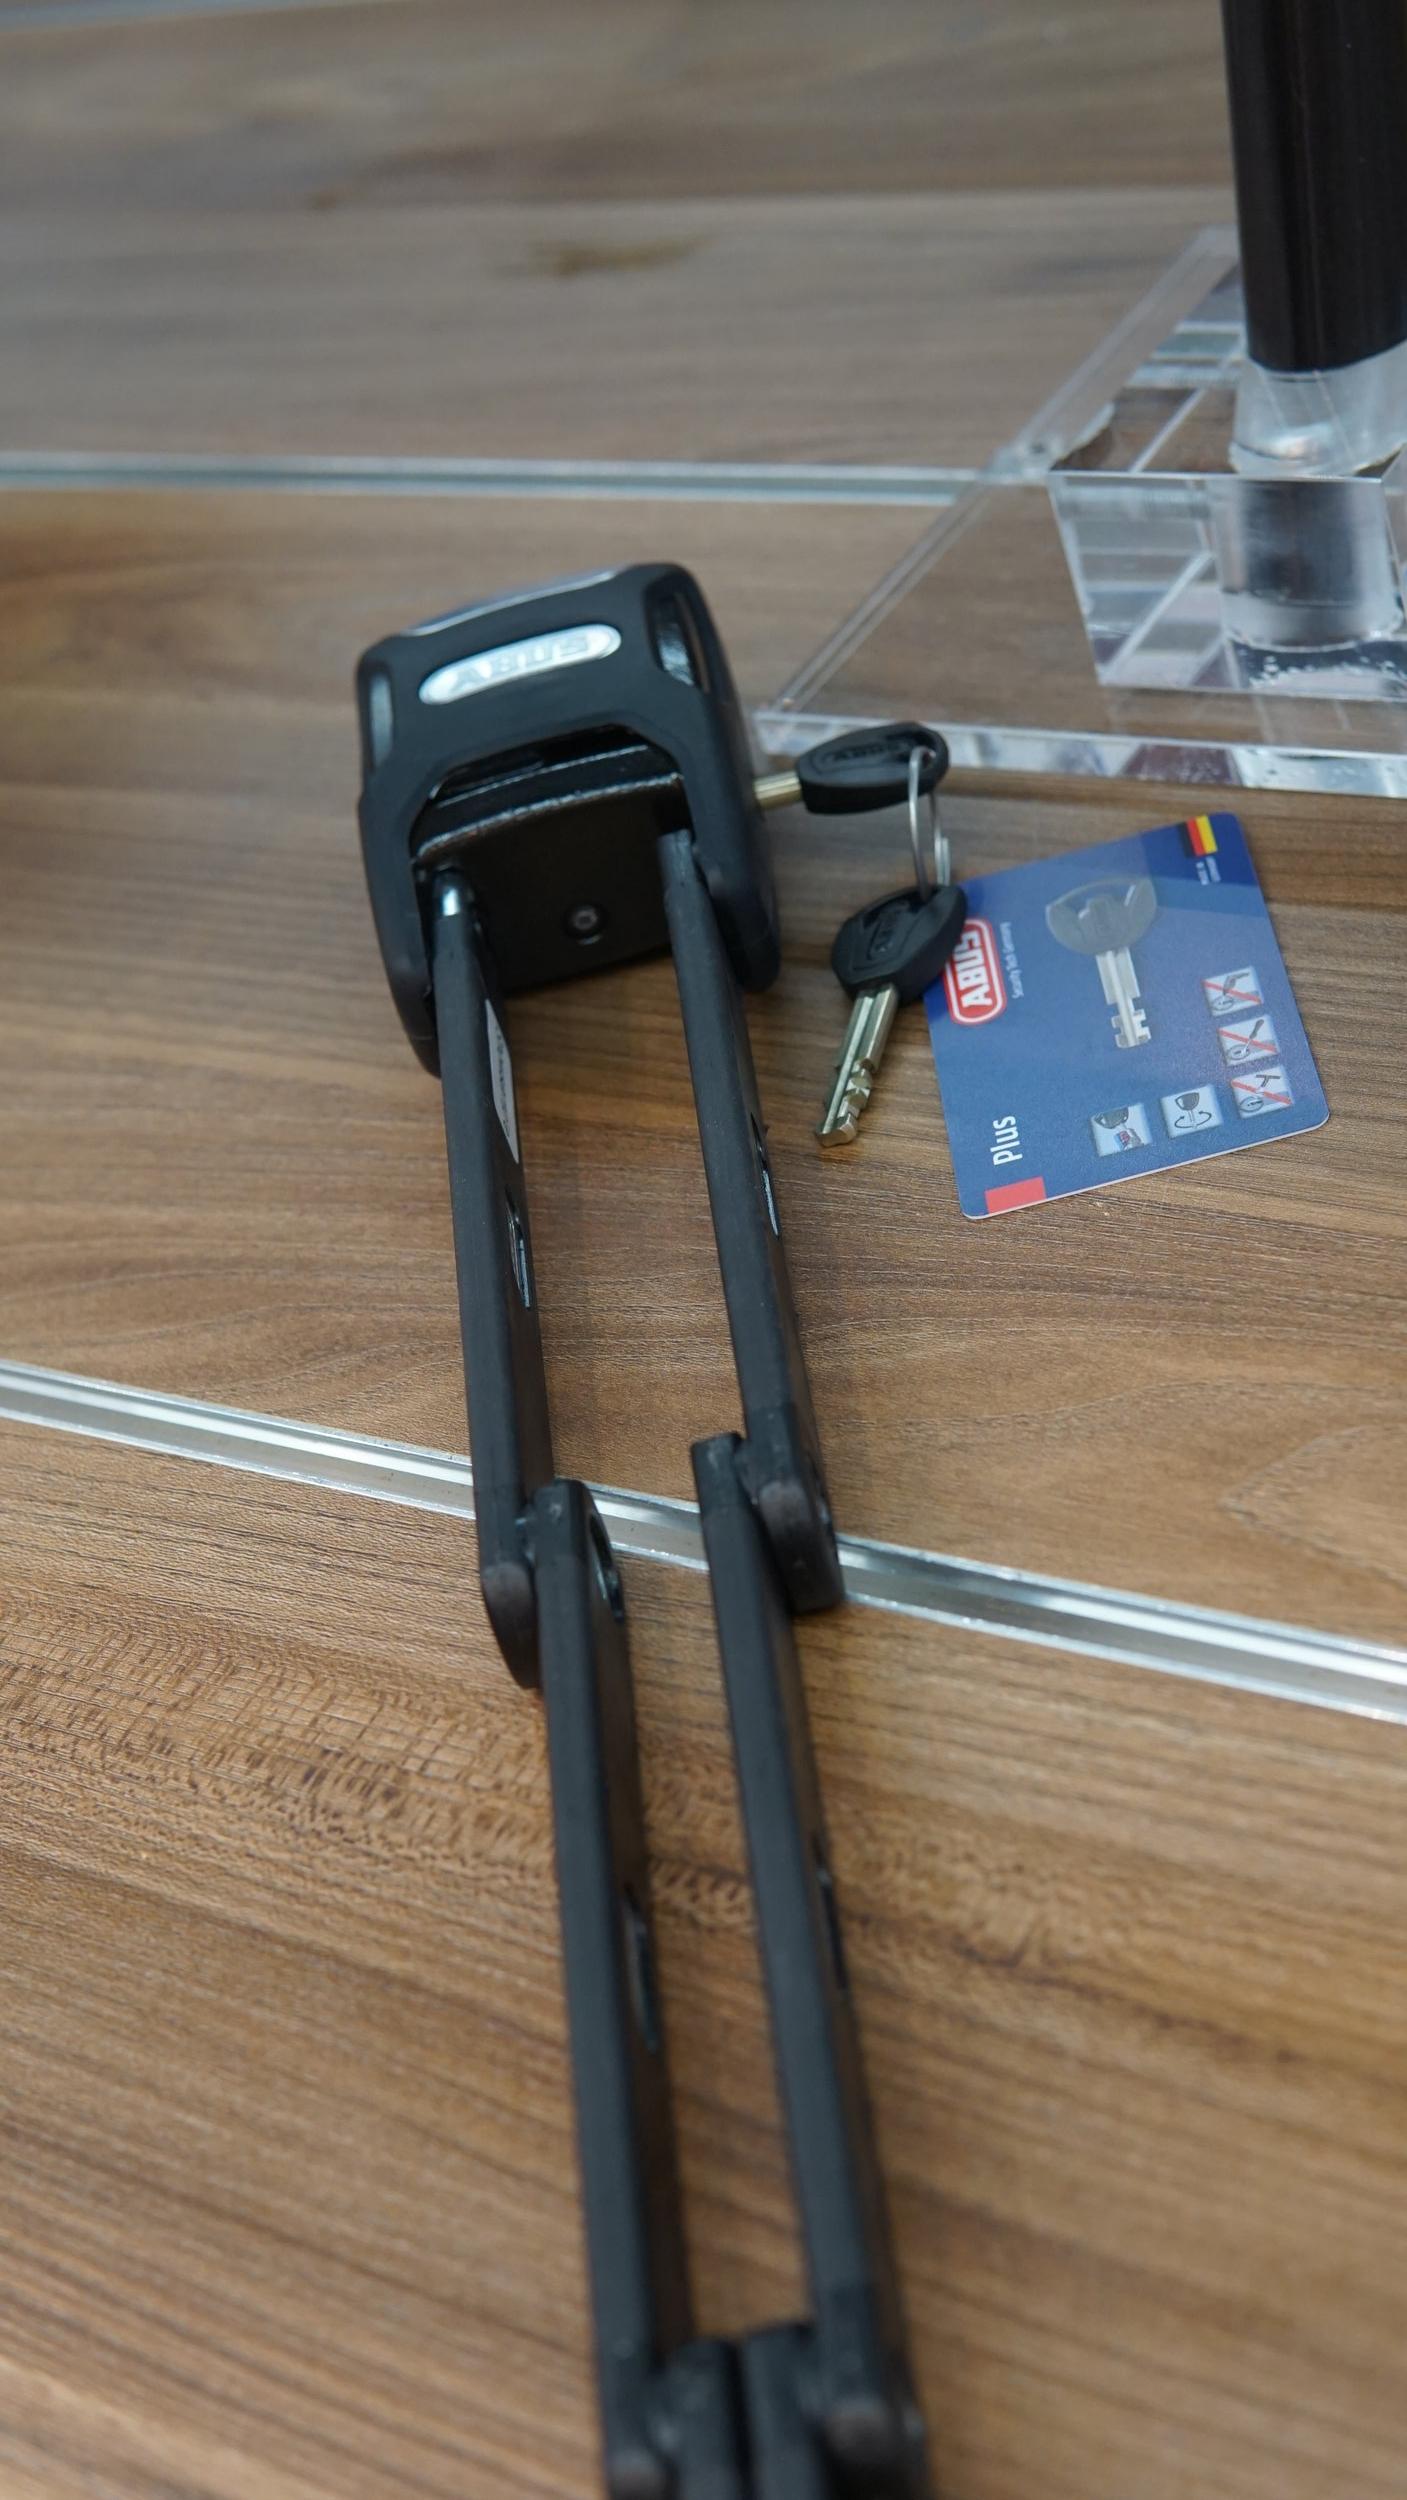 ABUS- bordo-600-a-190-alarm-bike-lock-montreal-canada.JPG